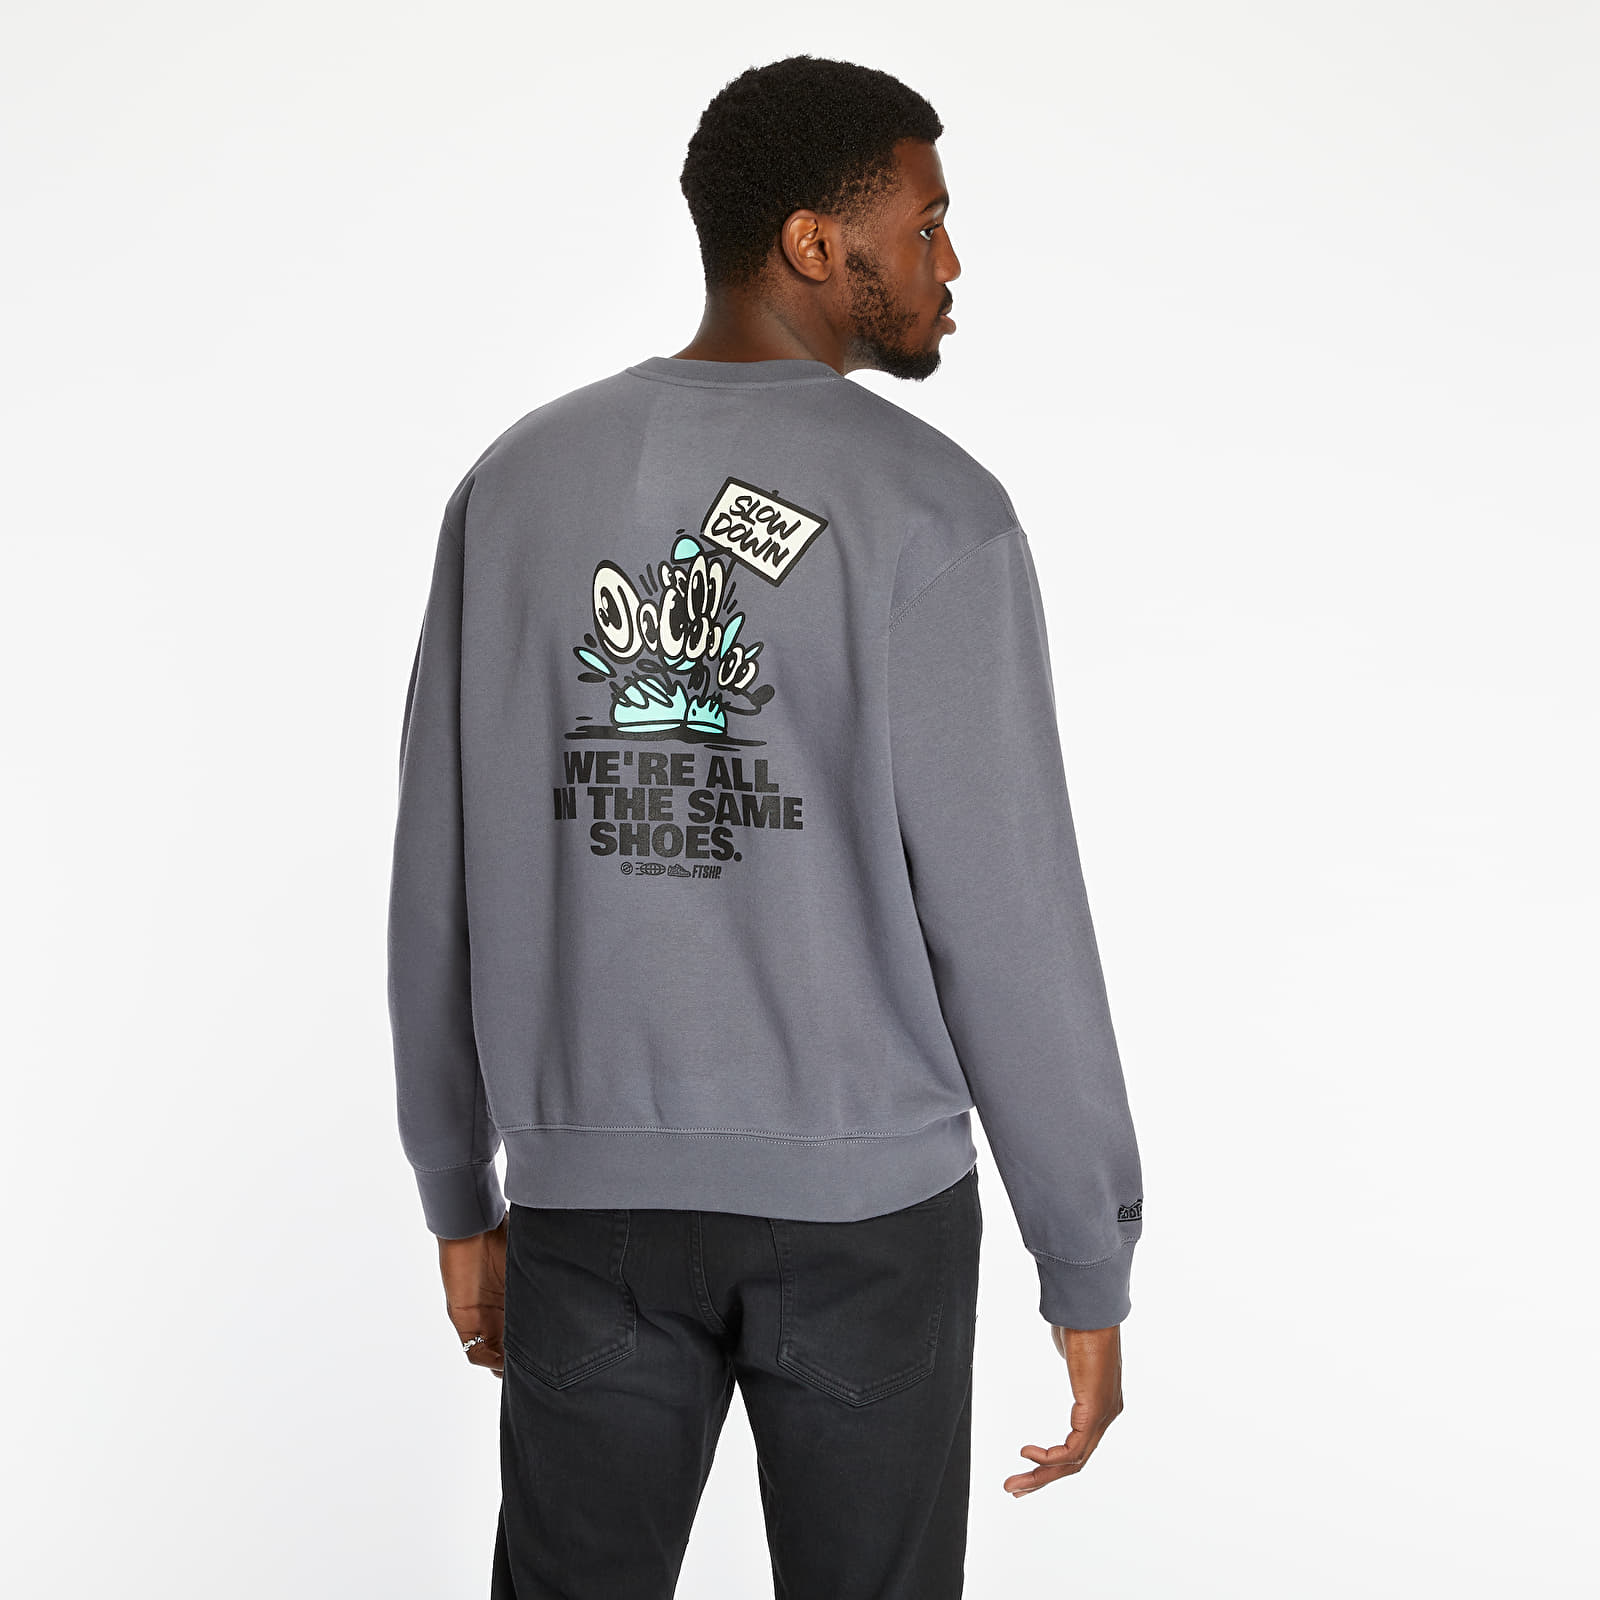 Sweatshirts Footshop Hungarian Artist Glow in the Dark Crewneck Solid Grey